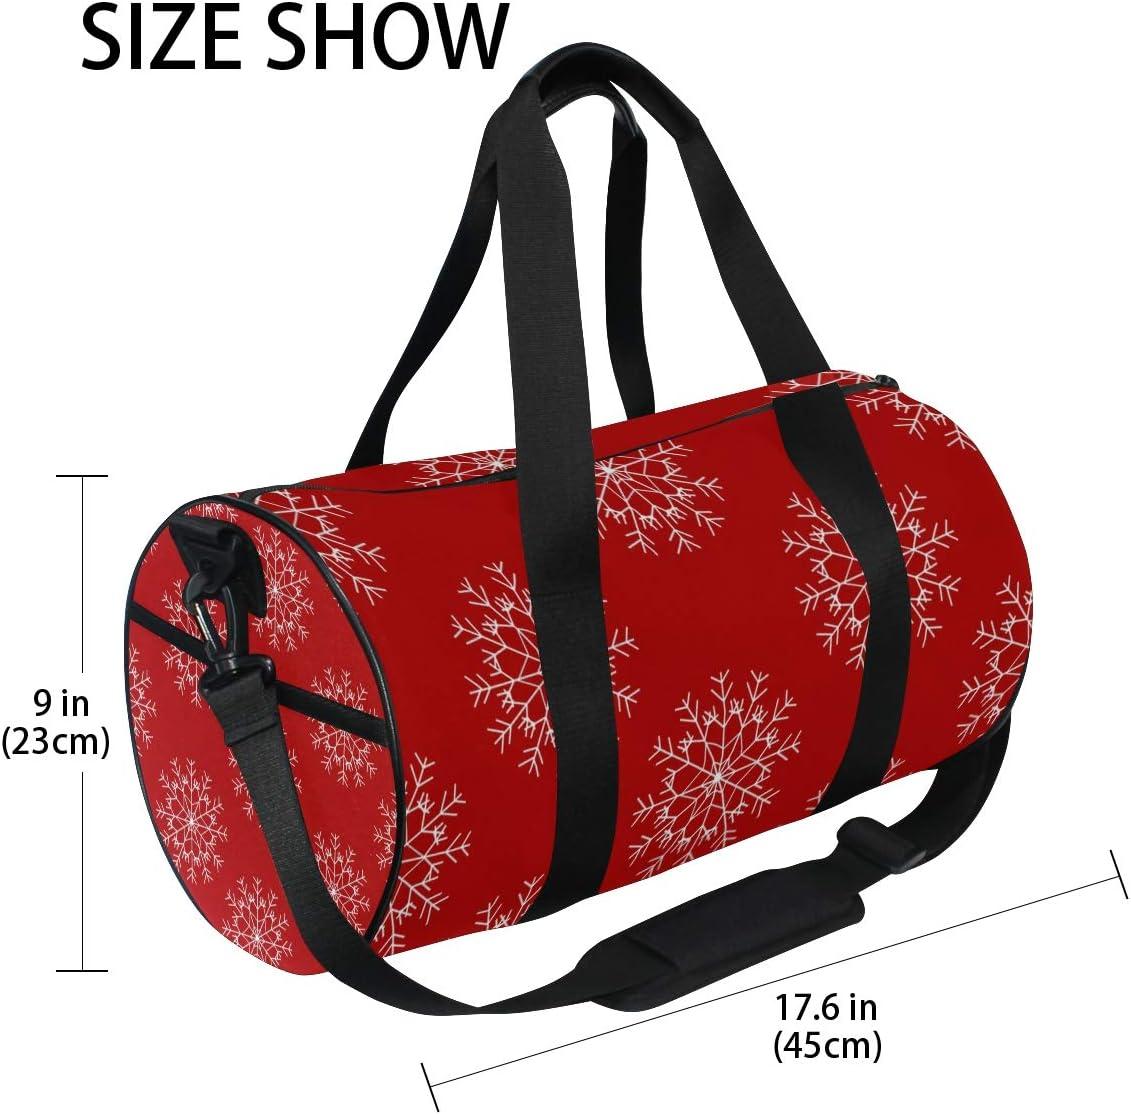 MALPLENA Poinsettia New Years Snowflake Drum gym duffel bag women Travel Bag